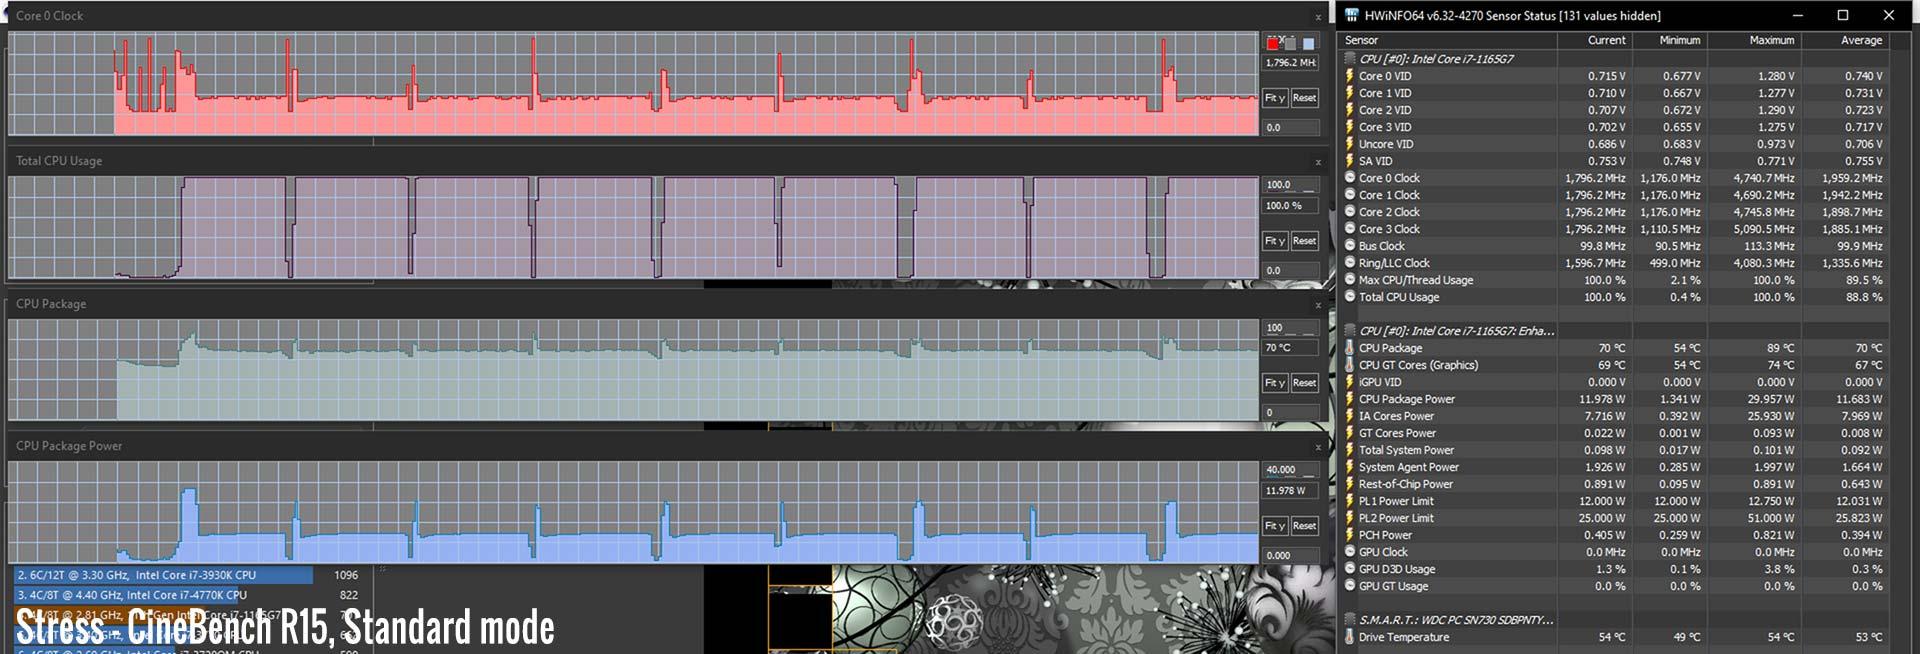 stress-cinebenchr15-standard